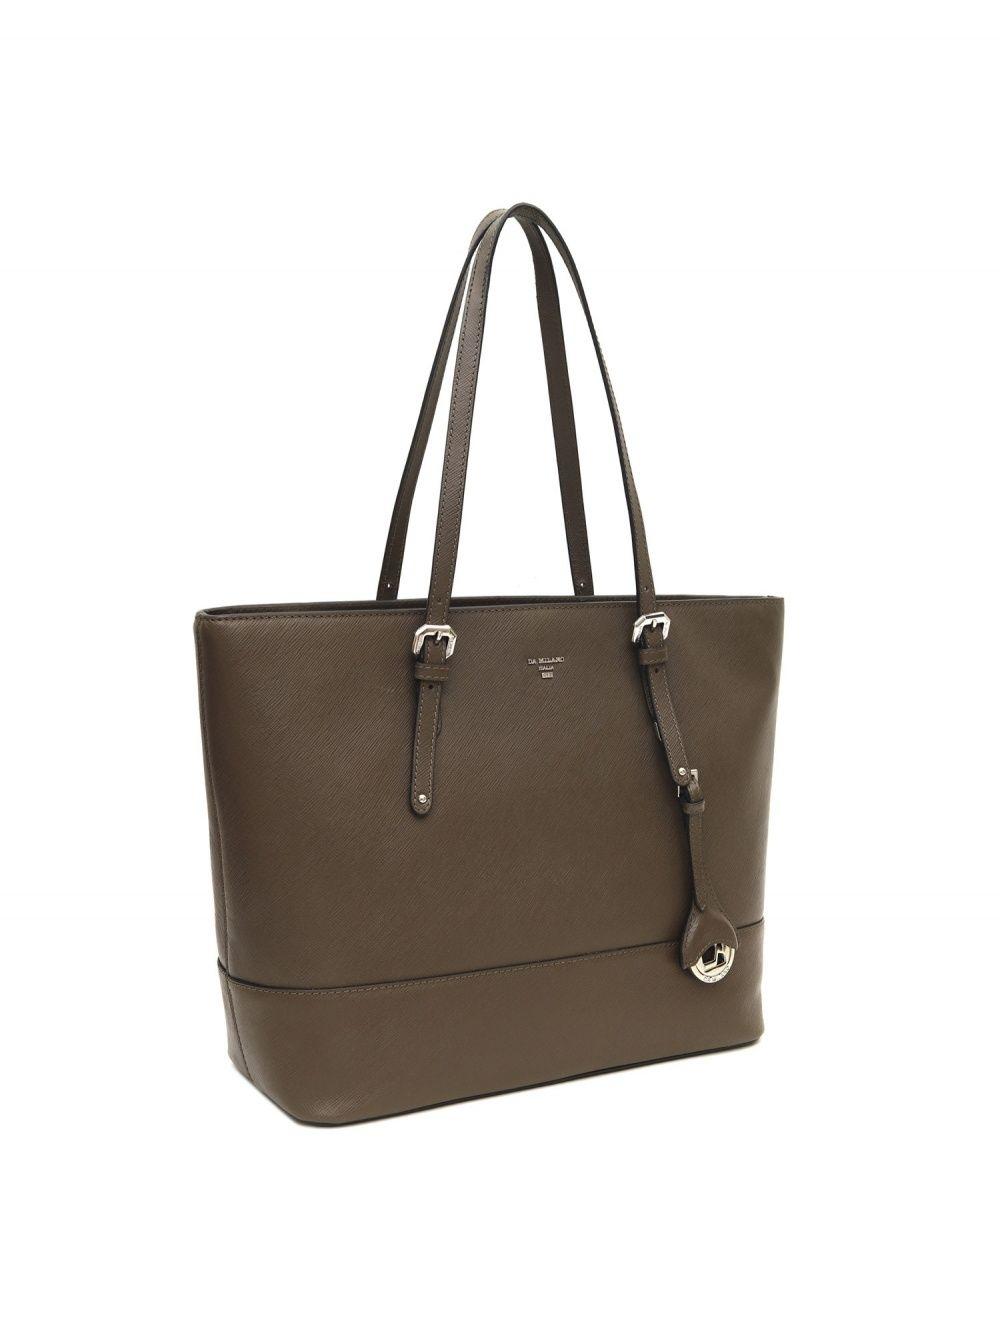 4e7a384517d Da Milano Handbags : Buy Da Milano LB-3771 Grey Genuine Leather ...